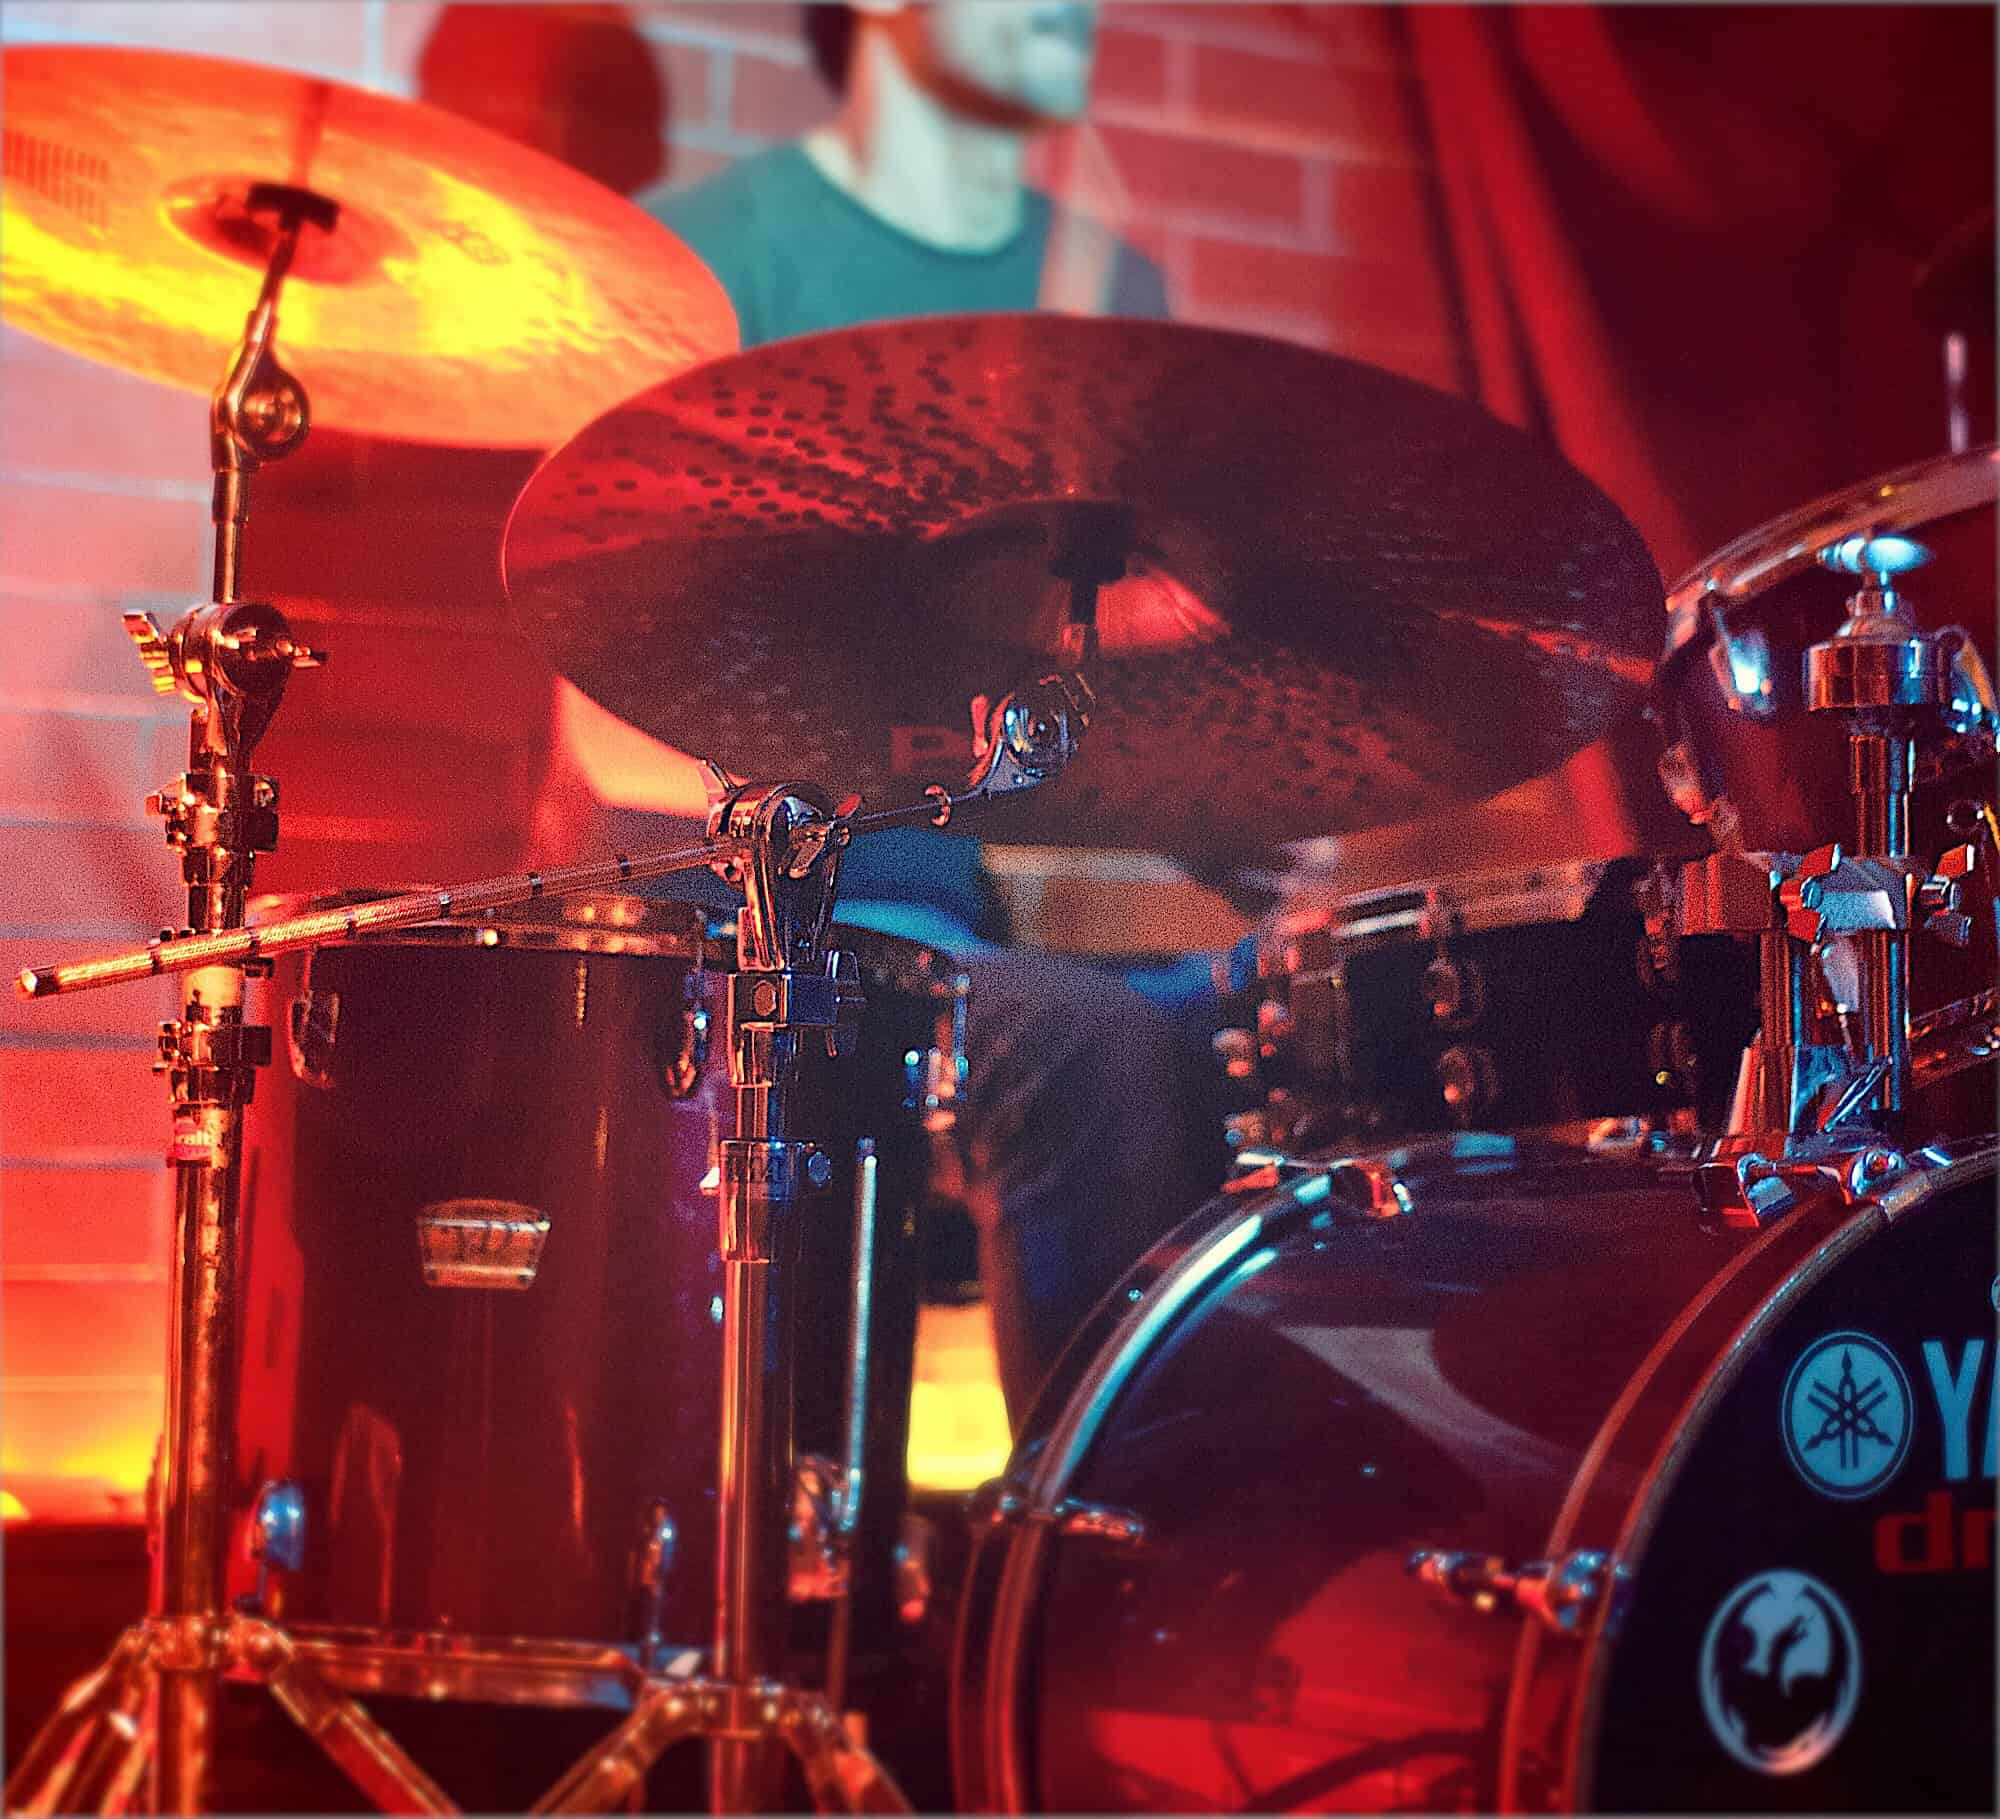 custom vibration drums